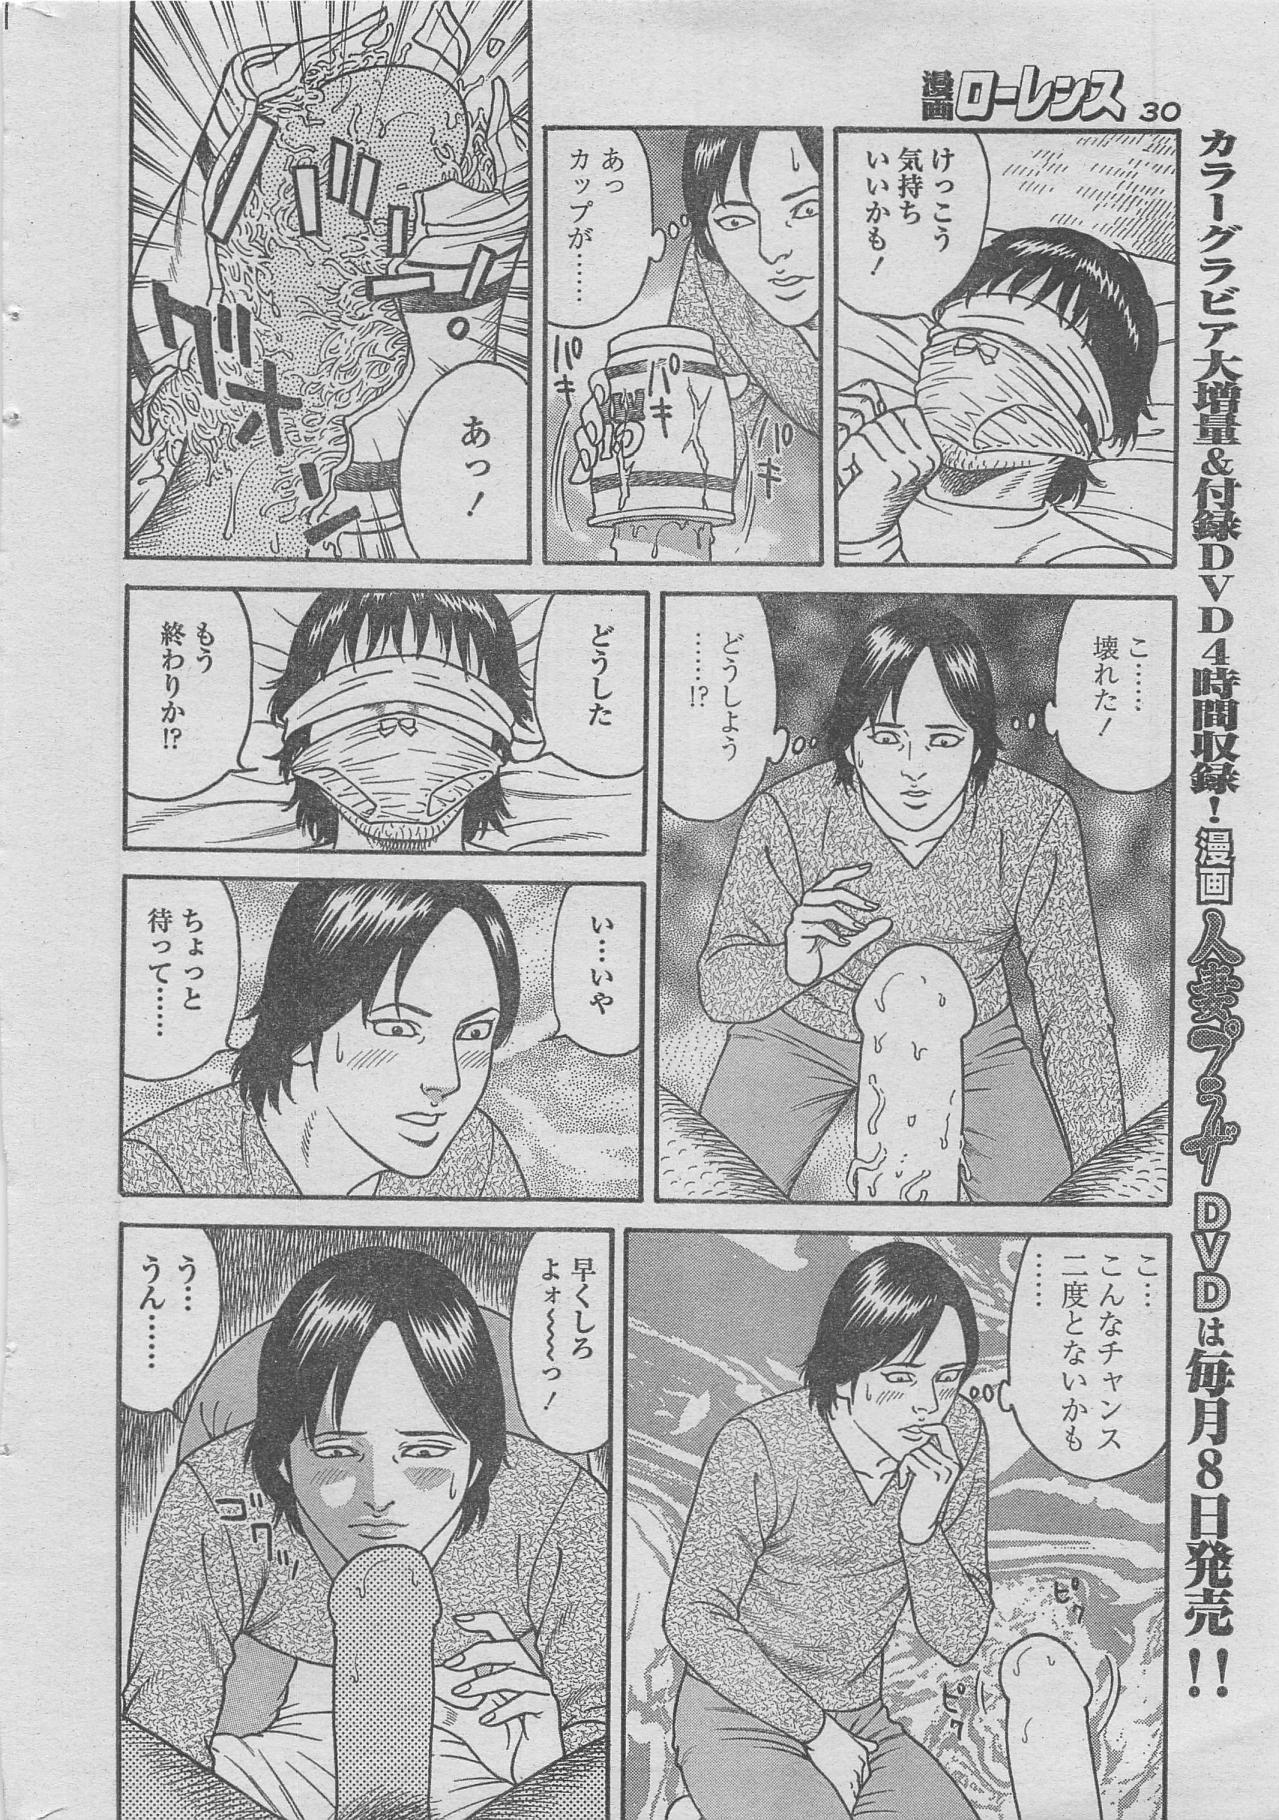 Manga Lawrence 2013-04 17